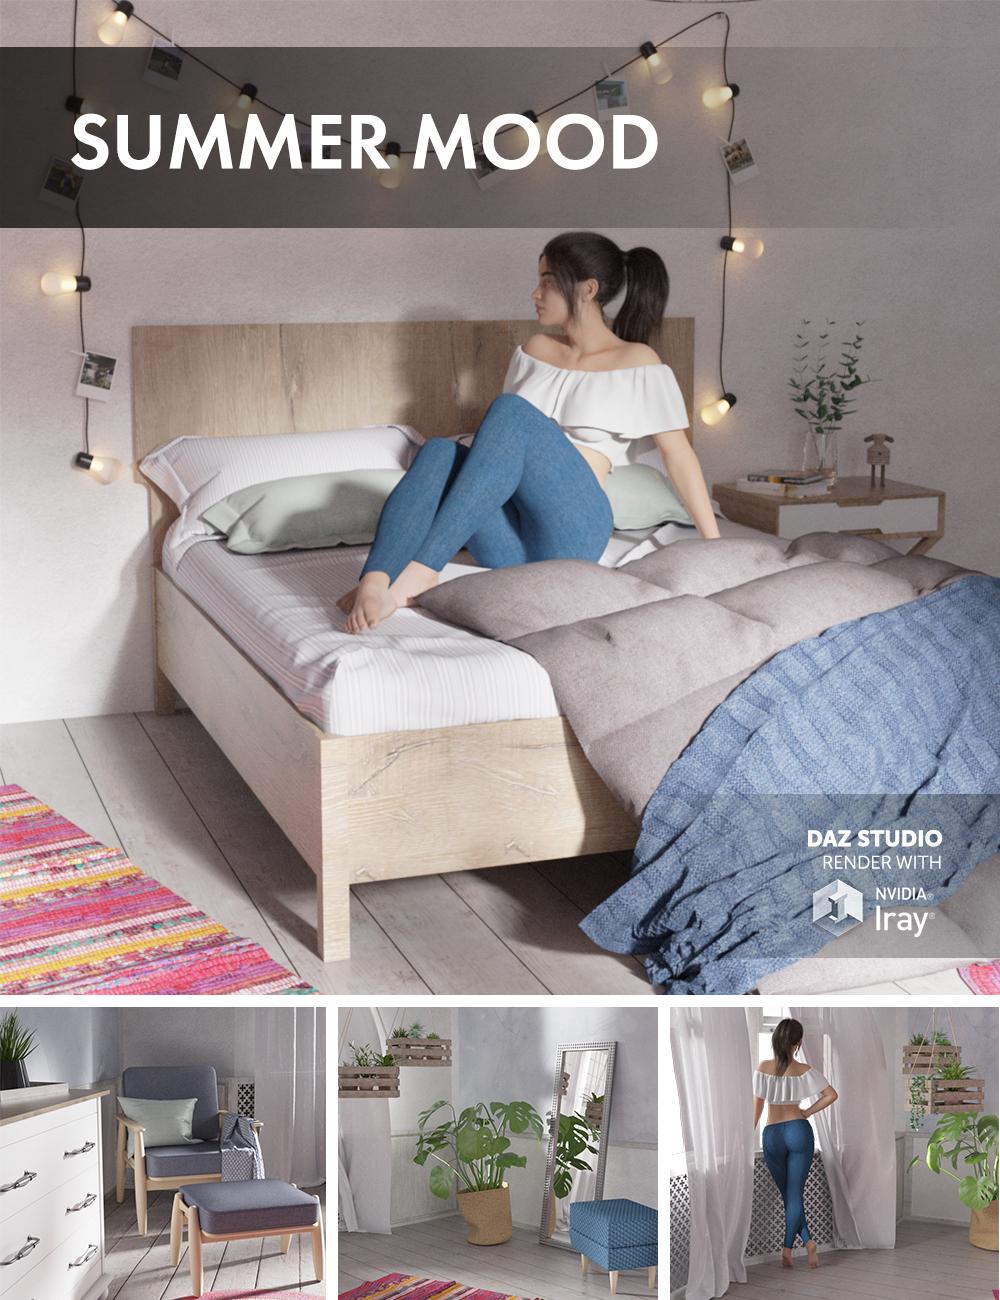 Summer Mood Bedroom by: Dimidrol, 3D Models by Daz 3D